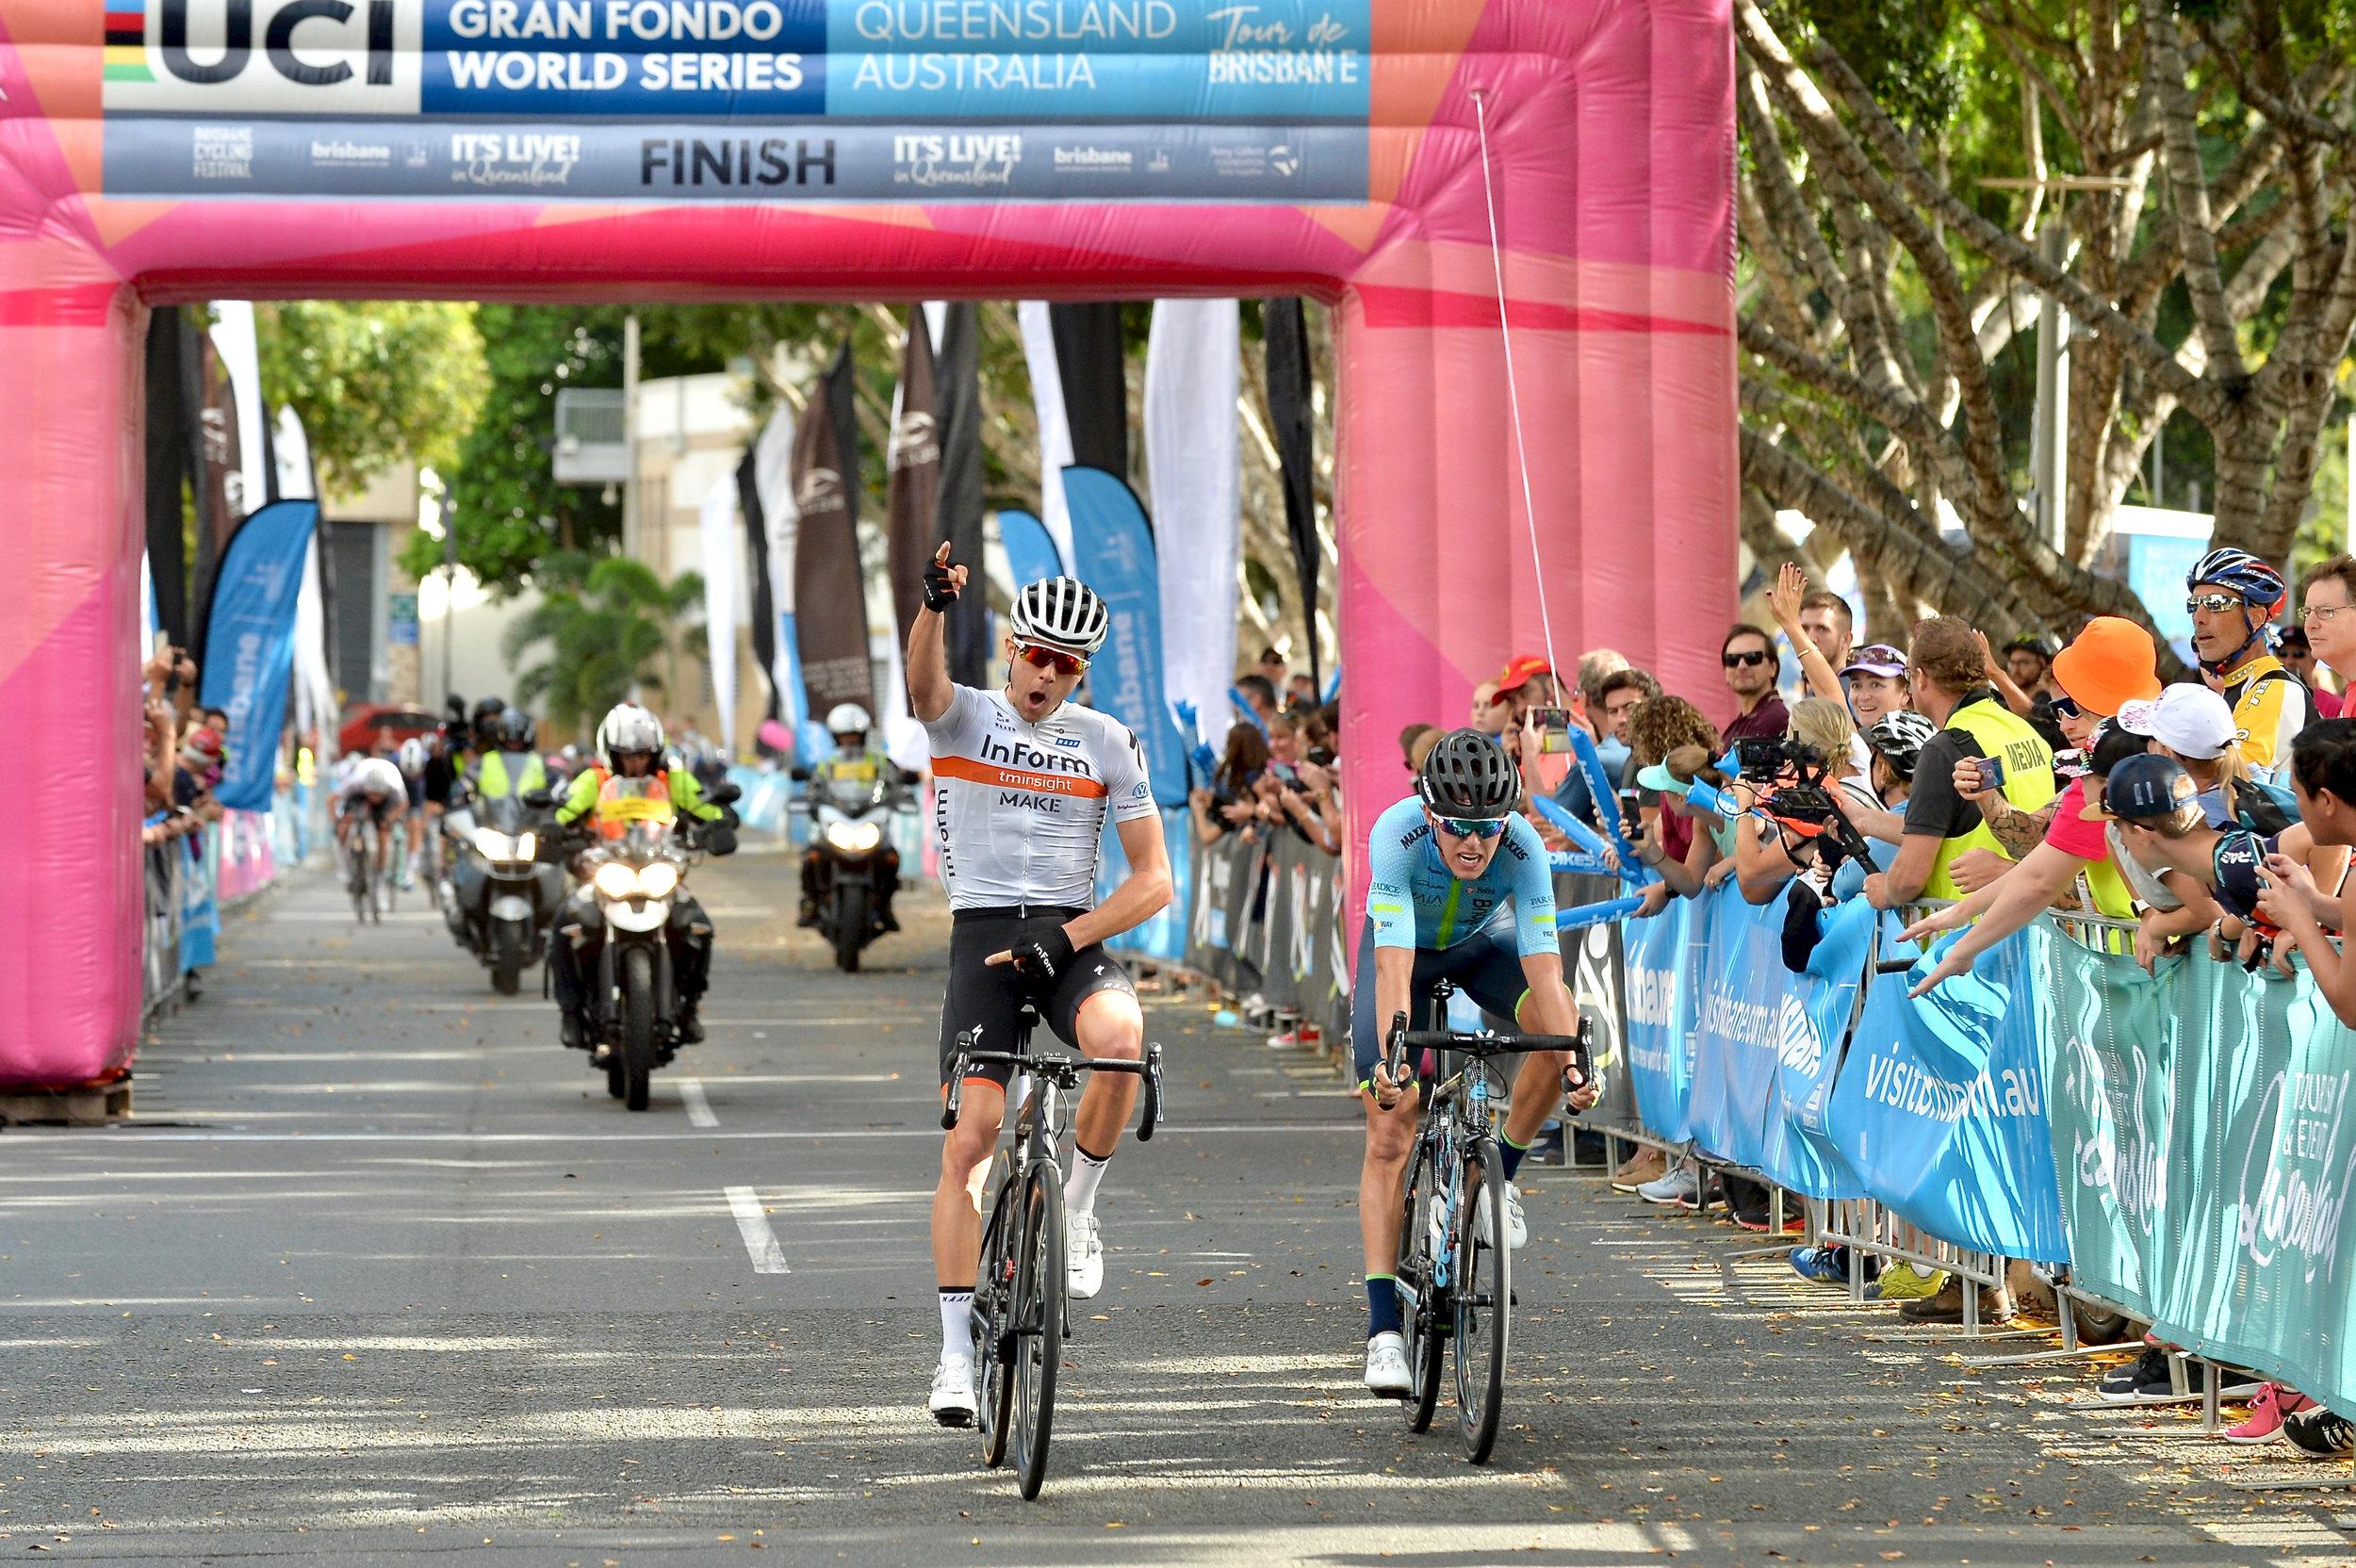 NRS Tour de Brisbane 2019 (56)-(ZF-8855-13480-1-013).jpg